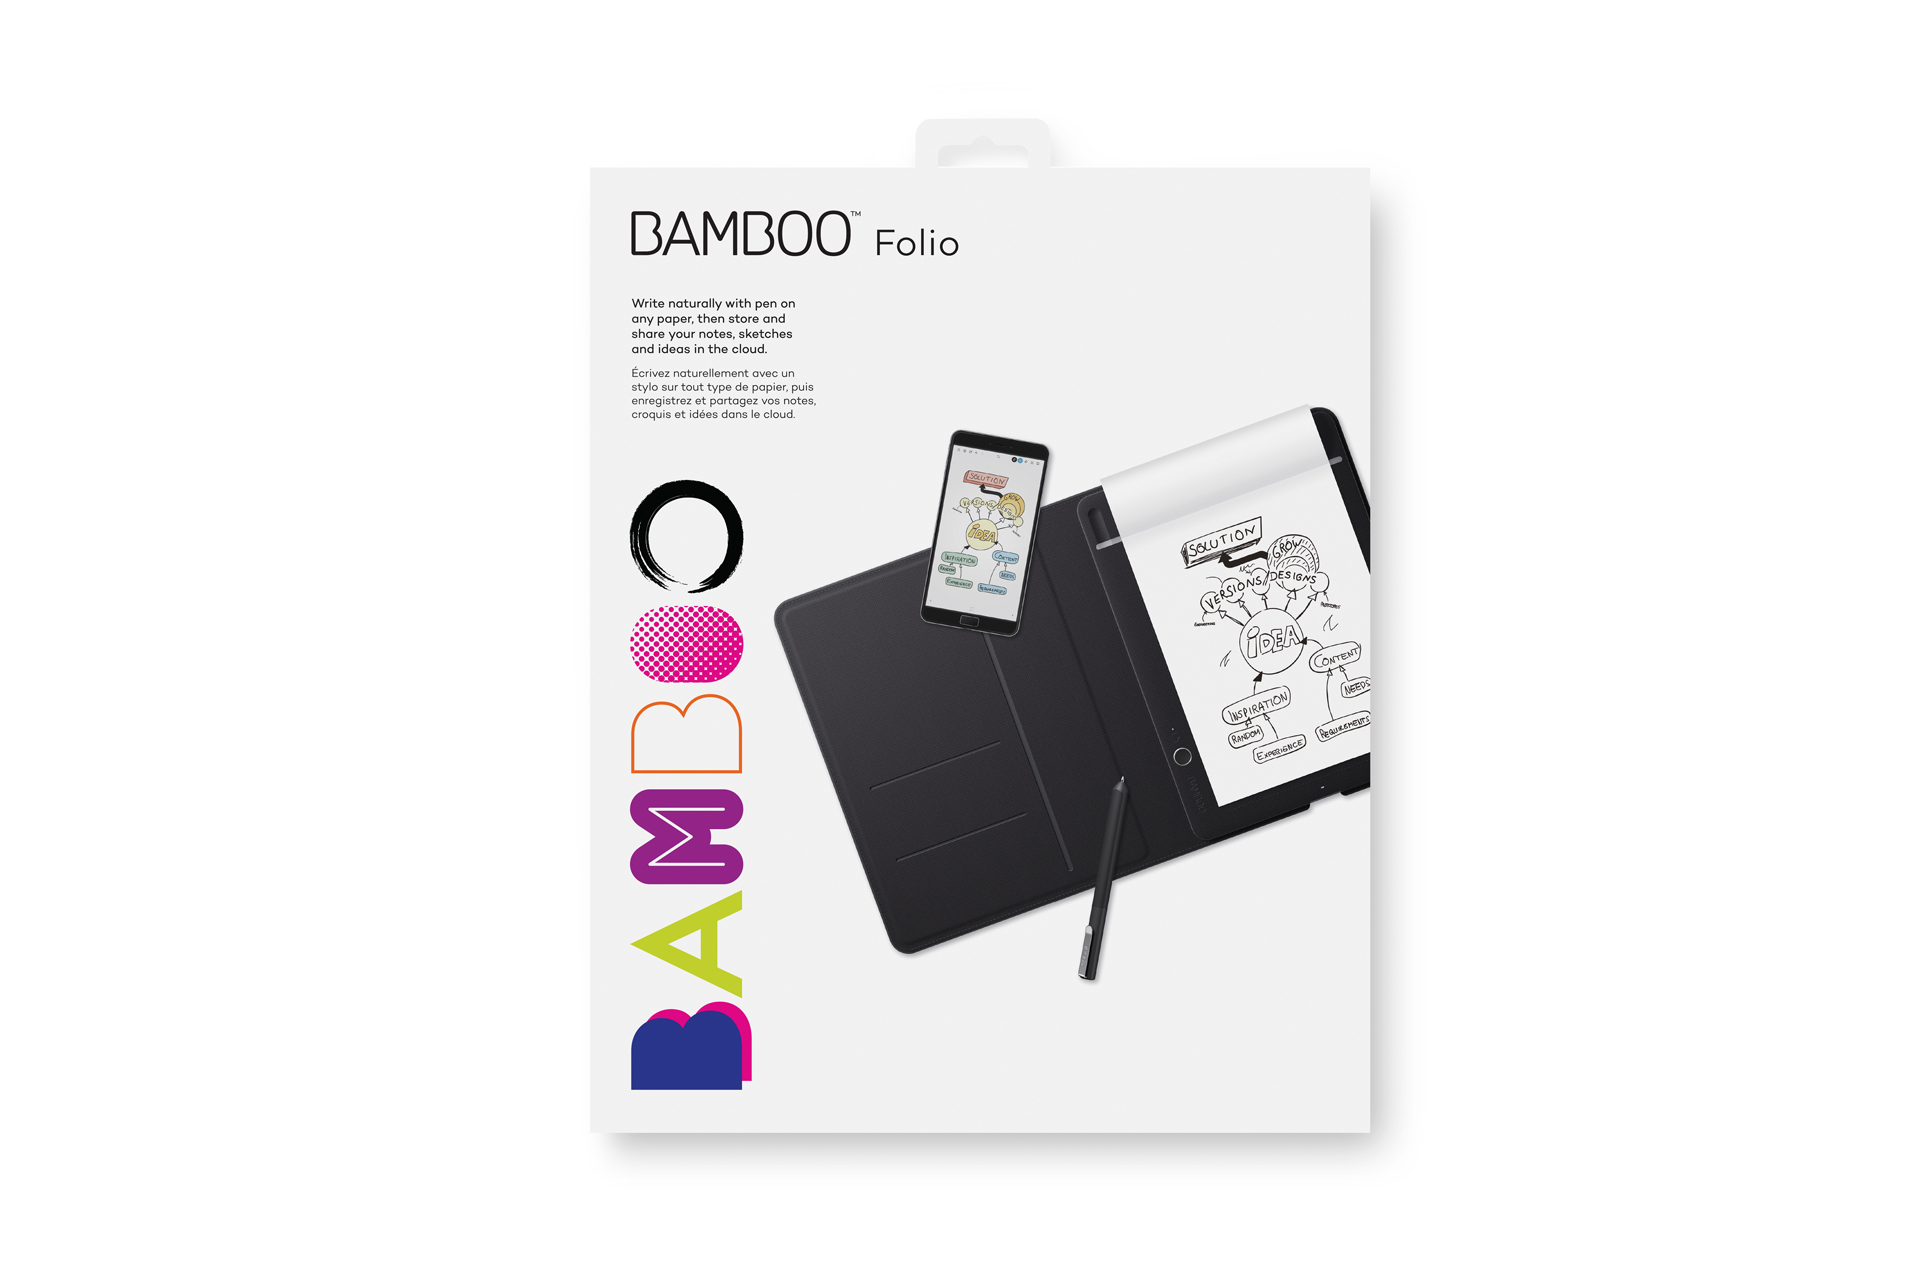 bamboo-folio